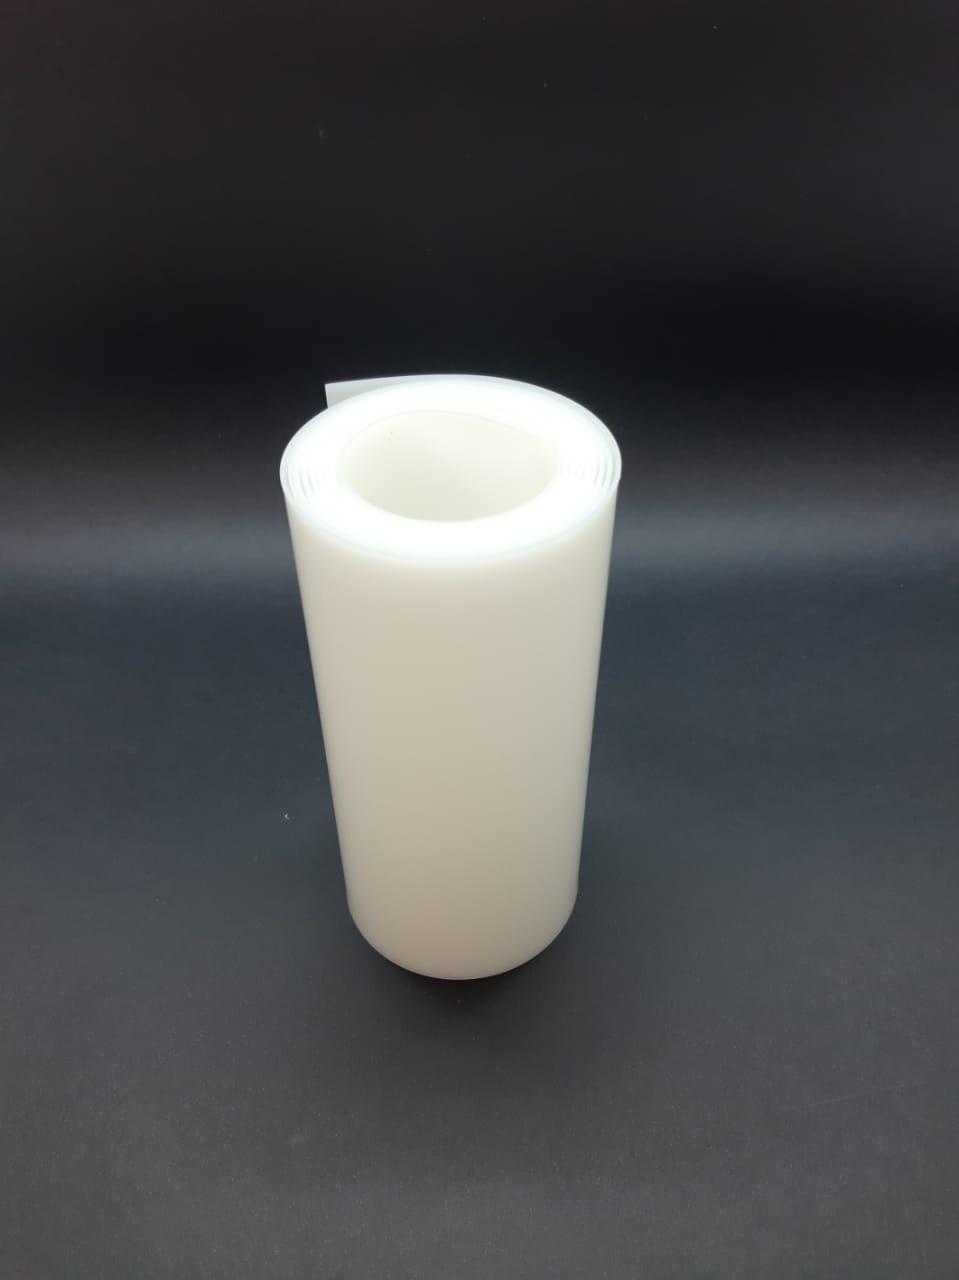 Tira de polietileno (PEAD) para bolo 1MM x 12CM x Ø55CM  - Santa Bella